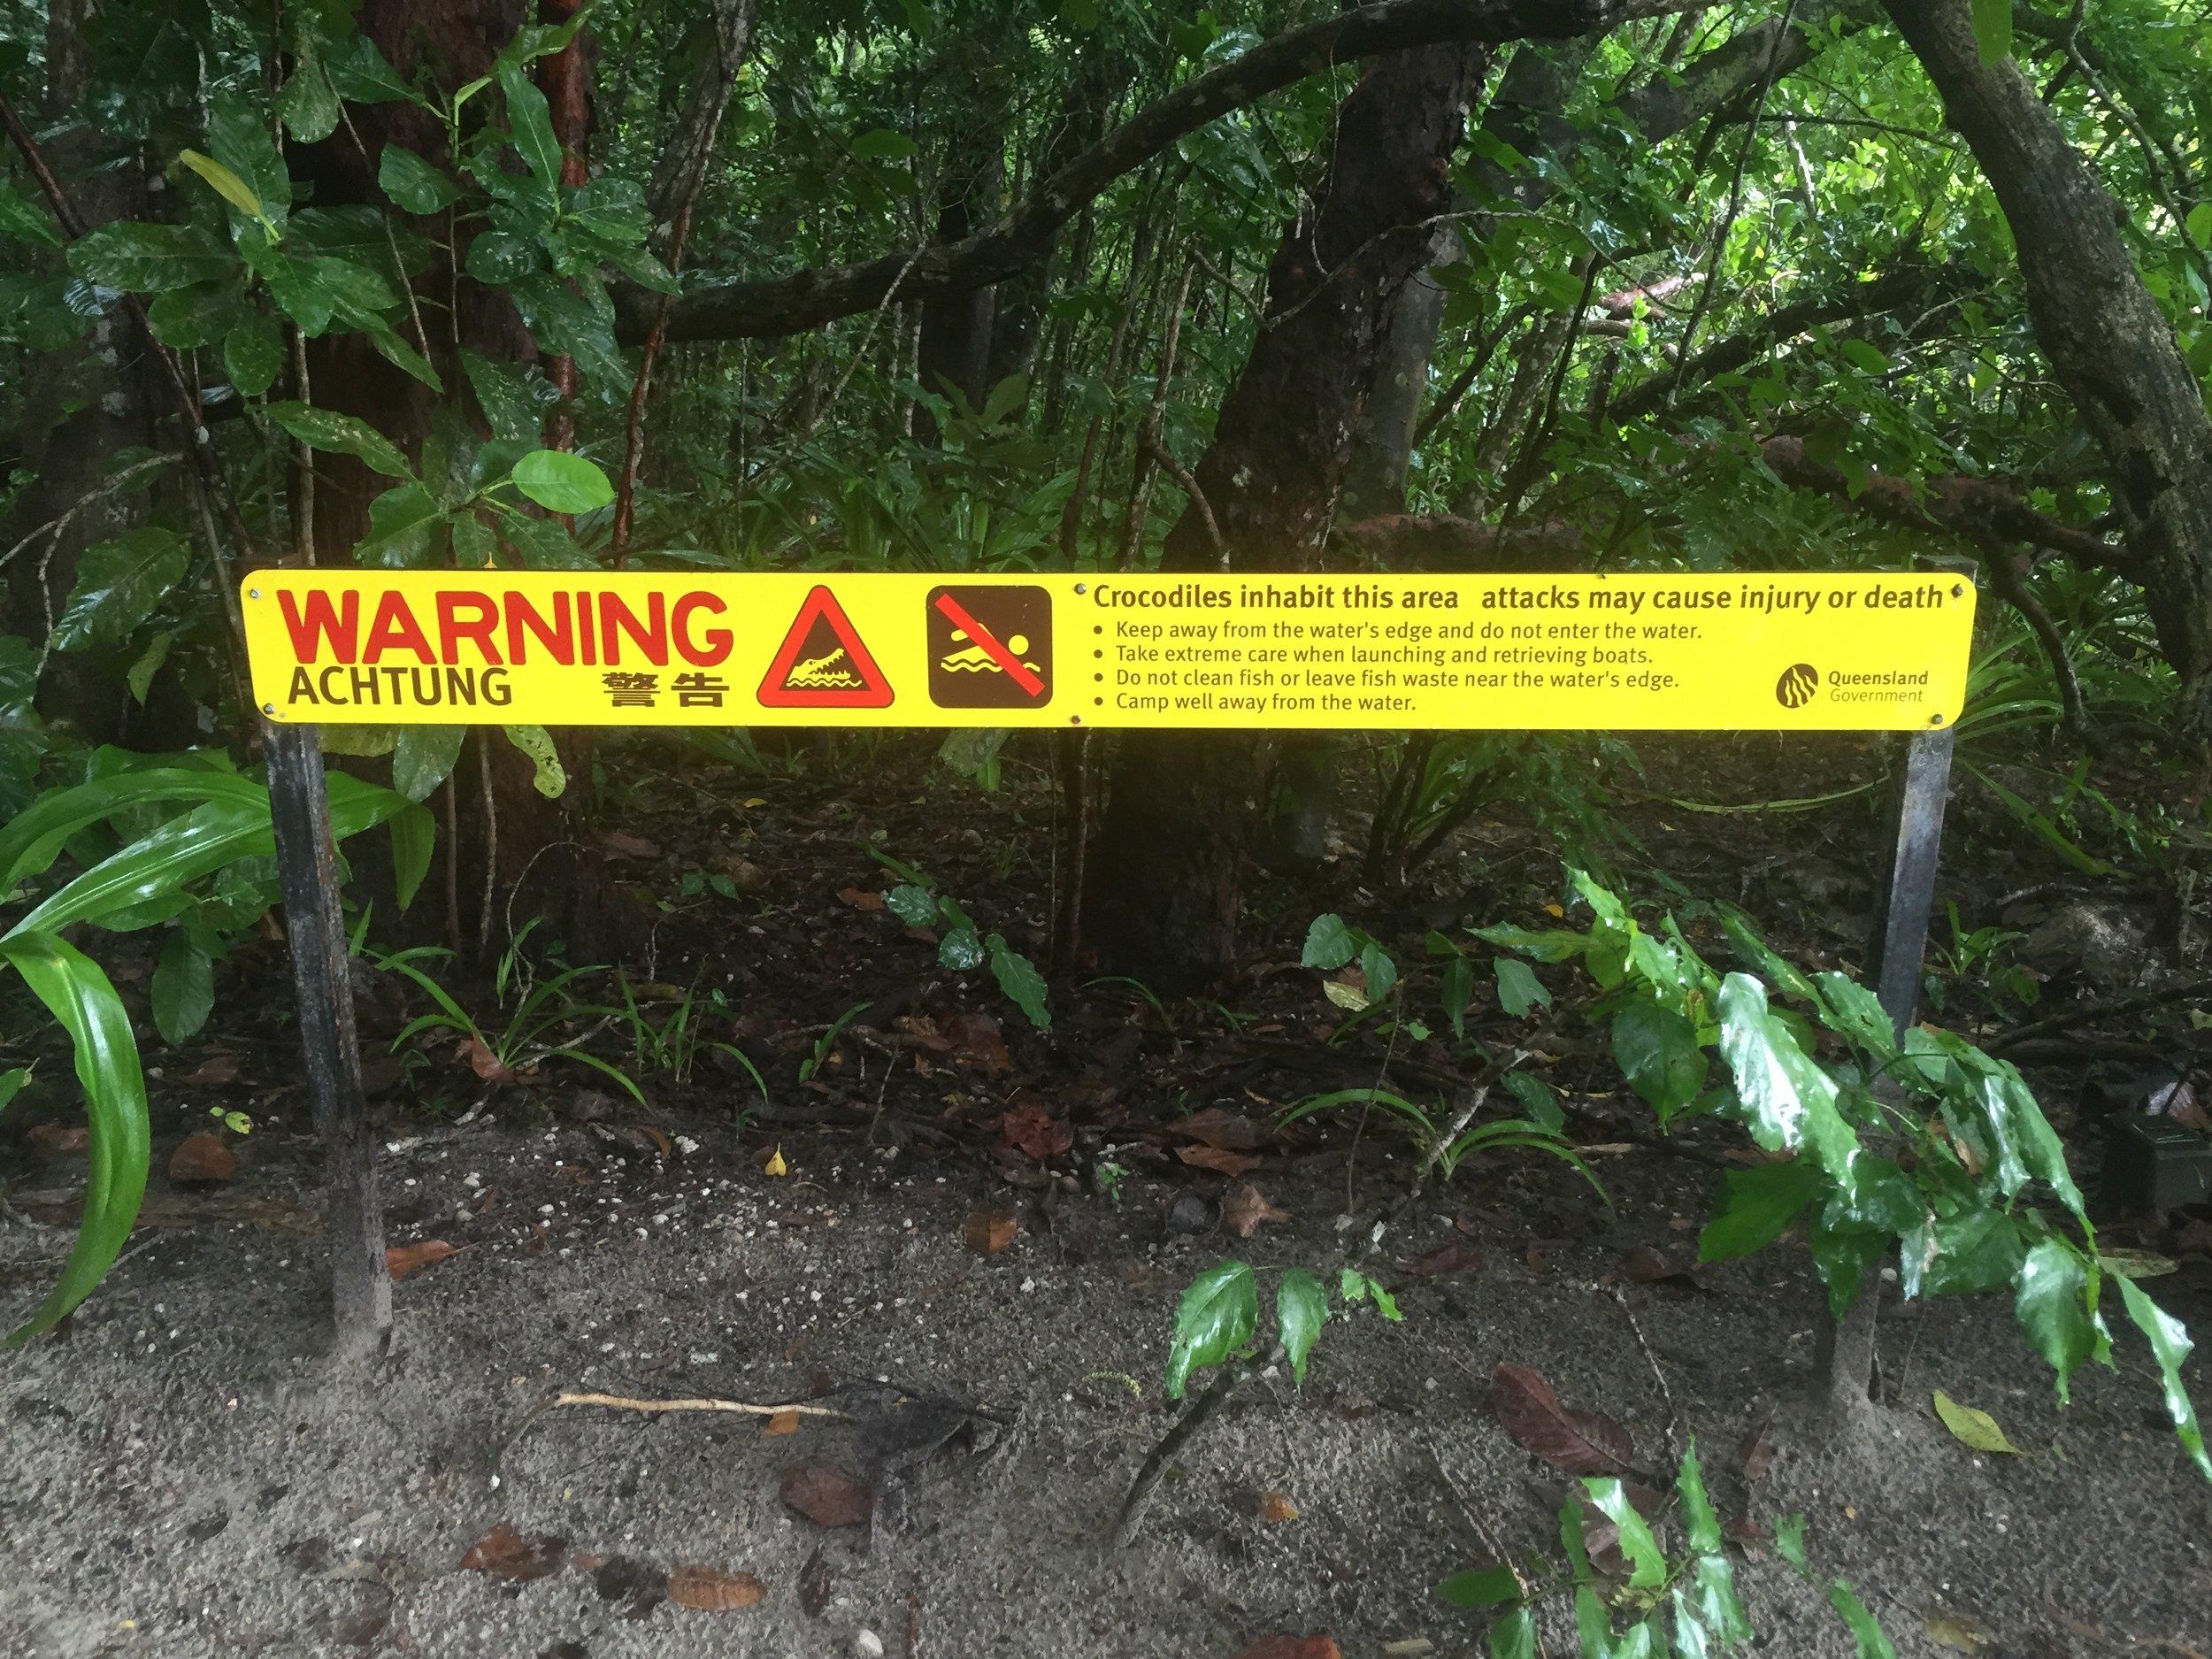 Warning about crocodiles